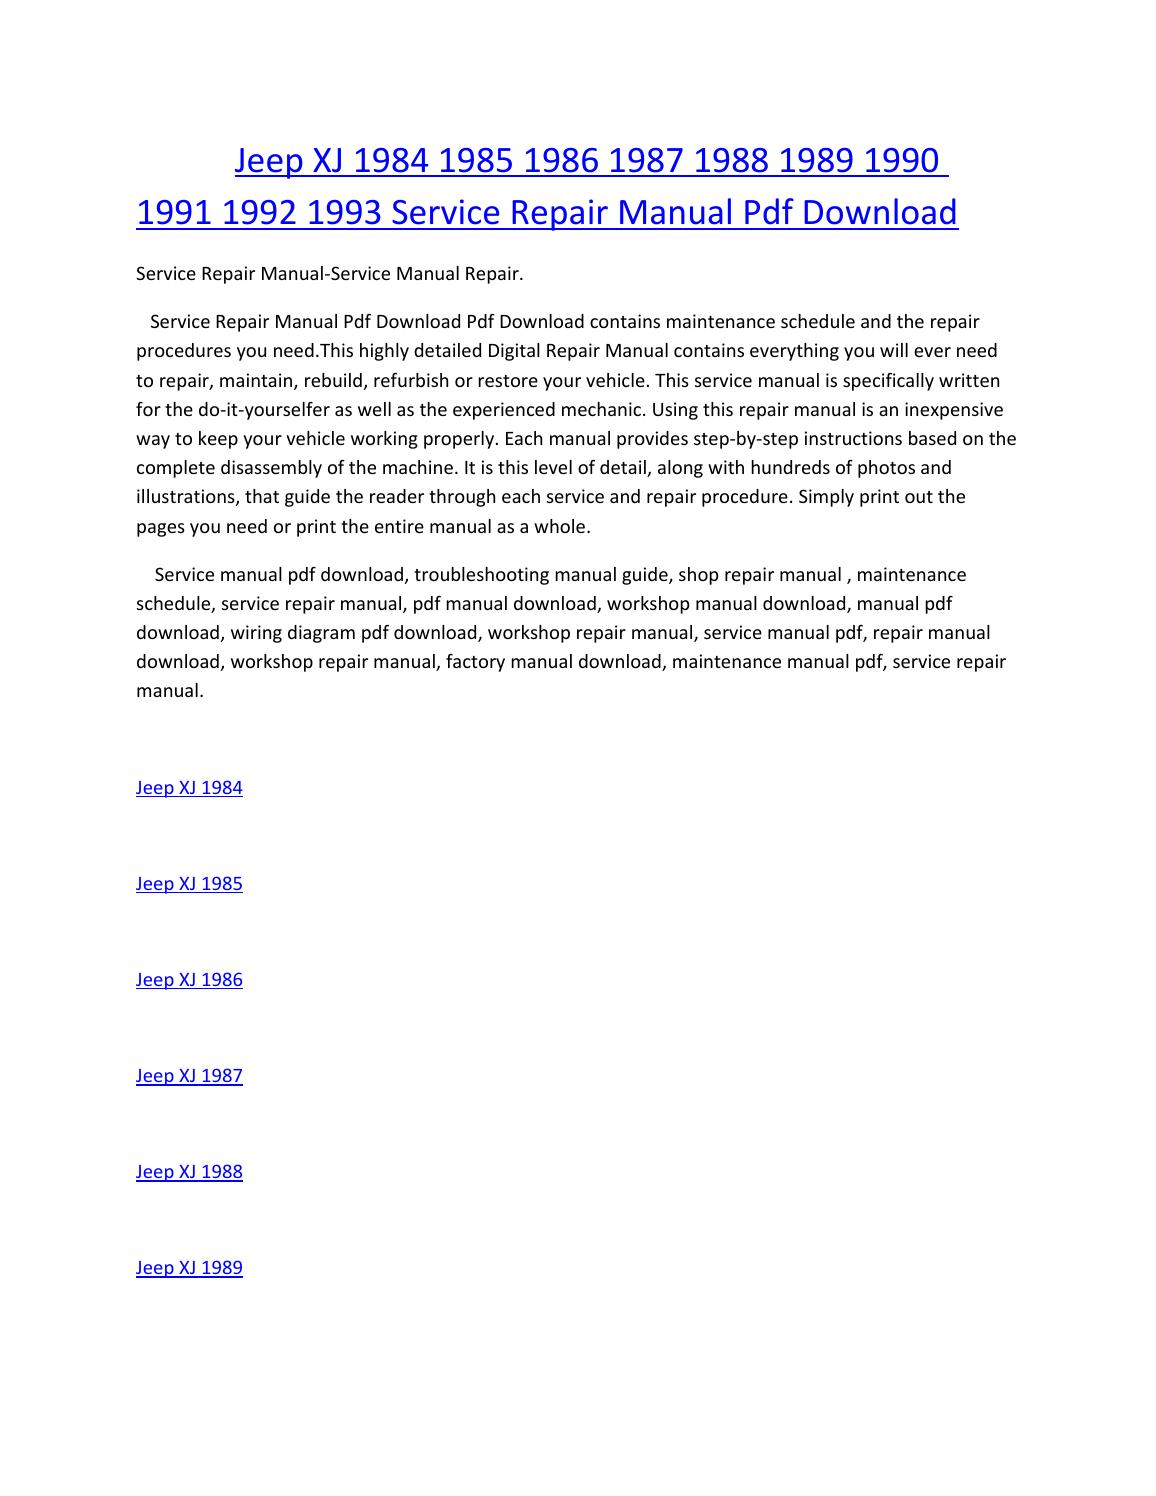 jeep xj 1984 1985 1986 1987 1988 1989 1990 1991 1992 1993 service manual  repair pdf download